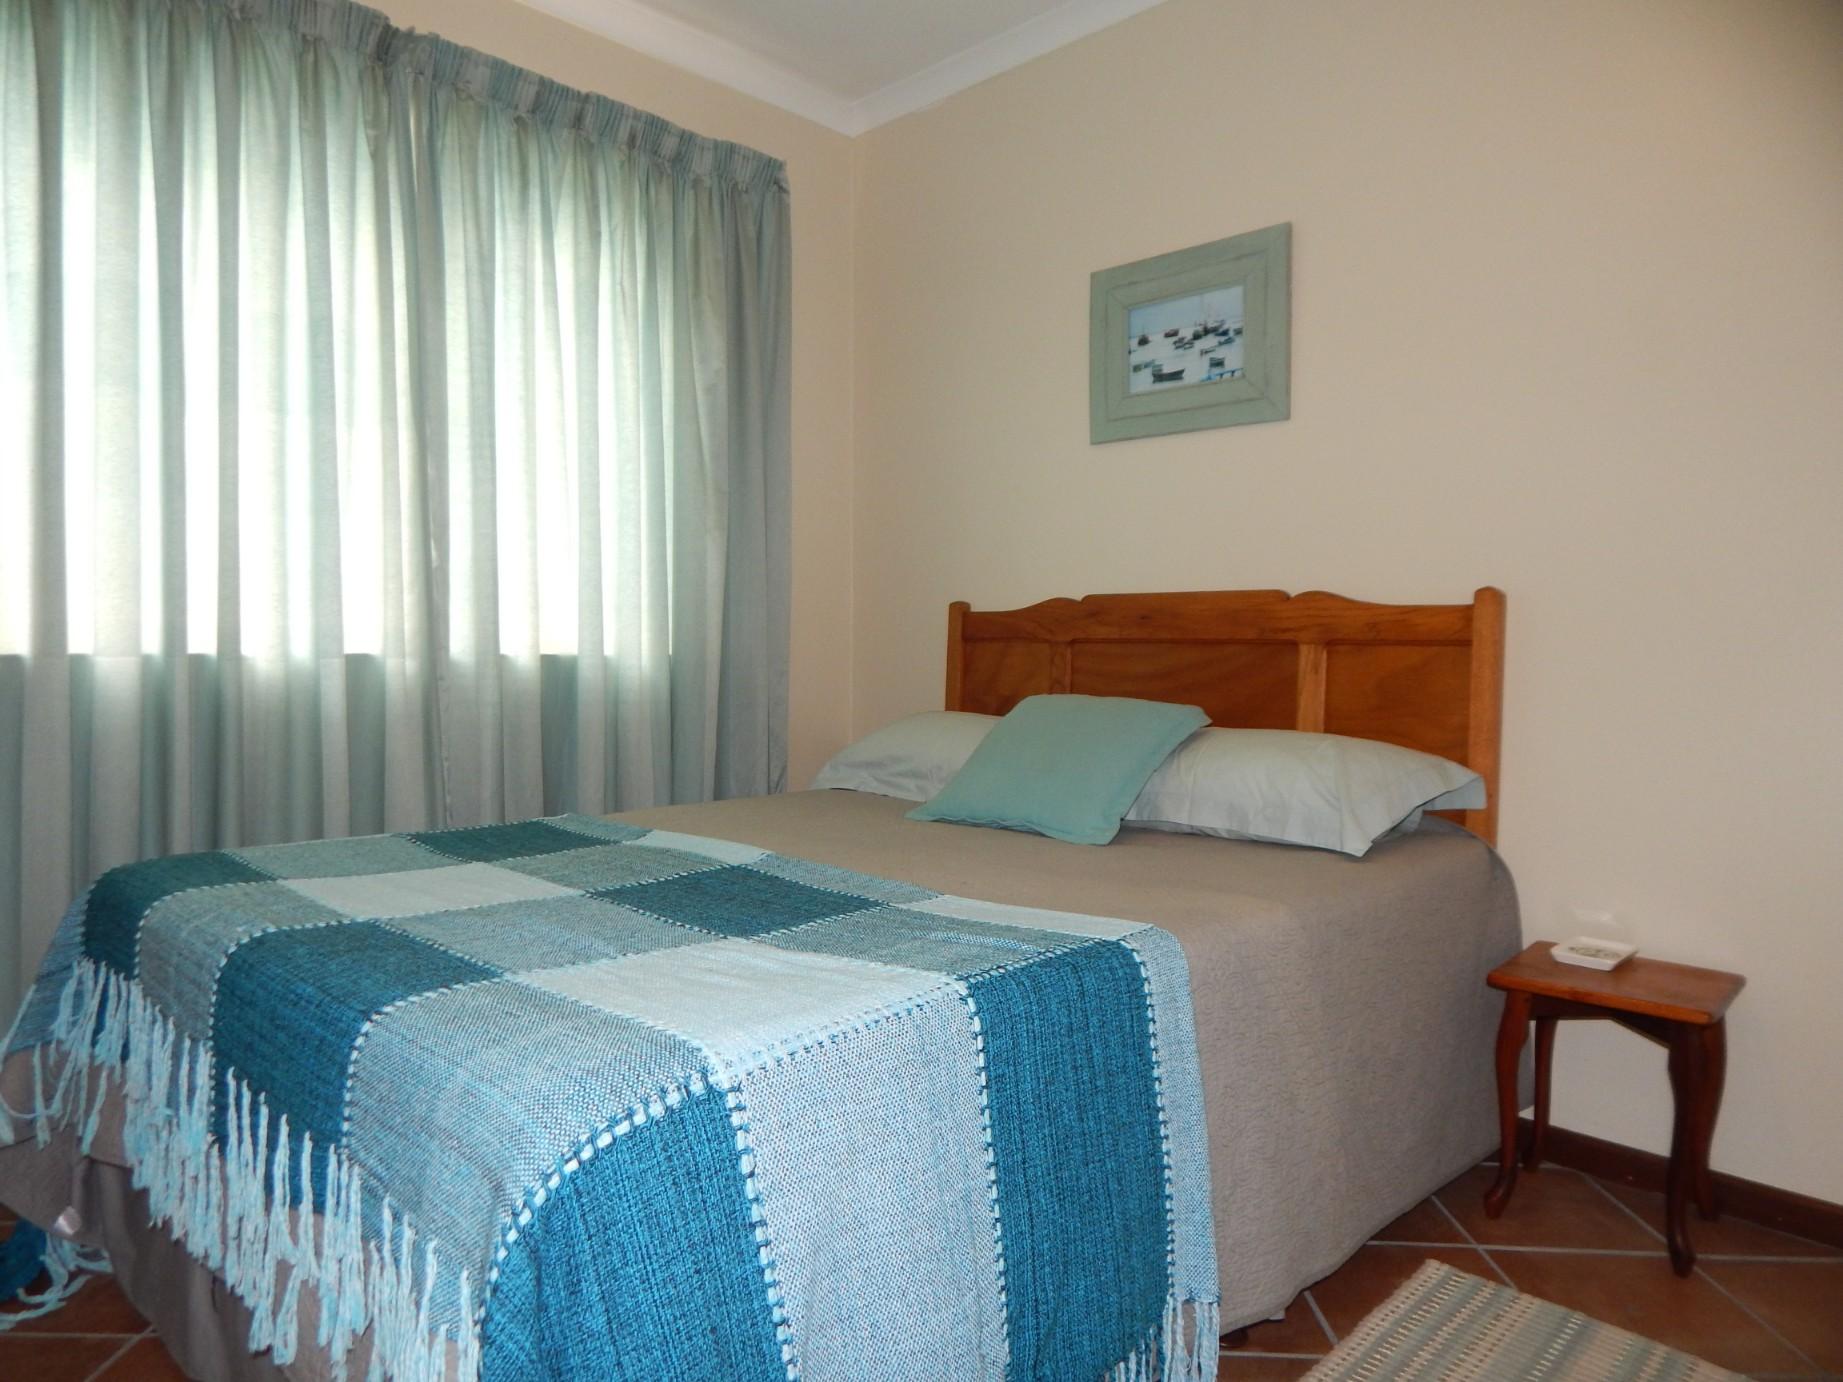 3 Bedroom Apartment for sale in De Bakke ENT0066483 : photo#17